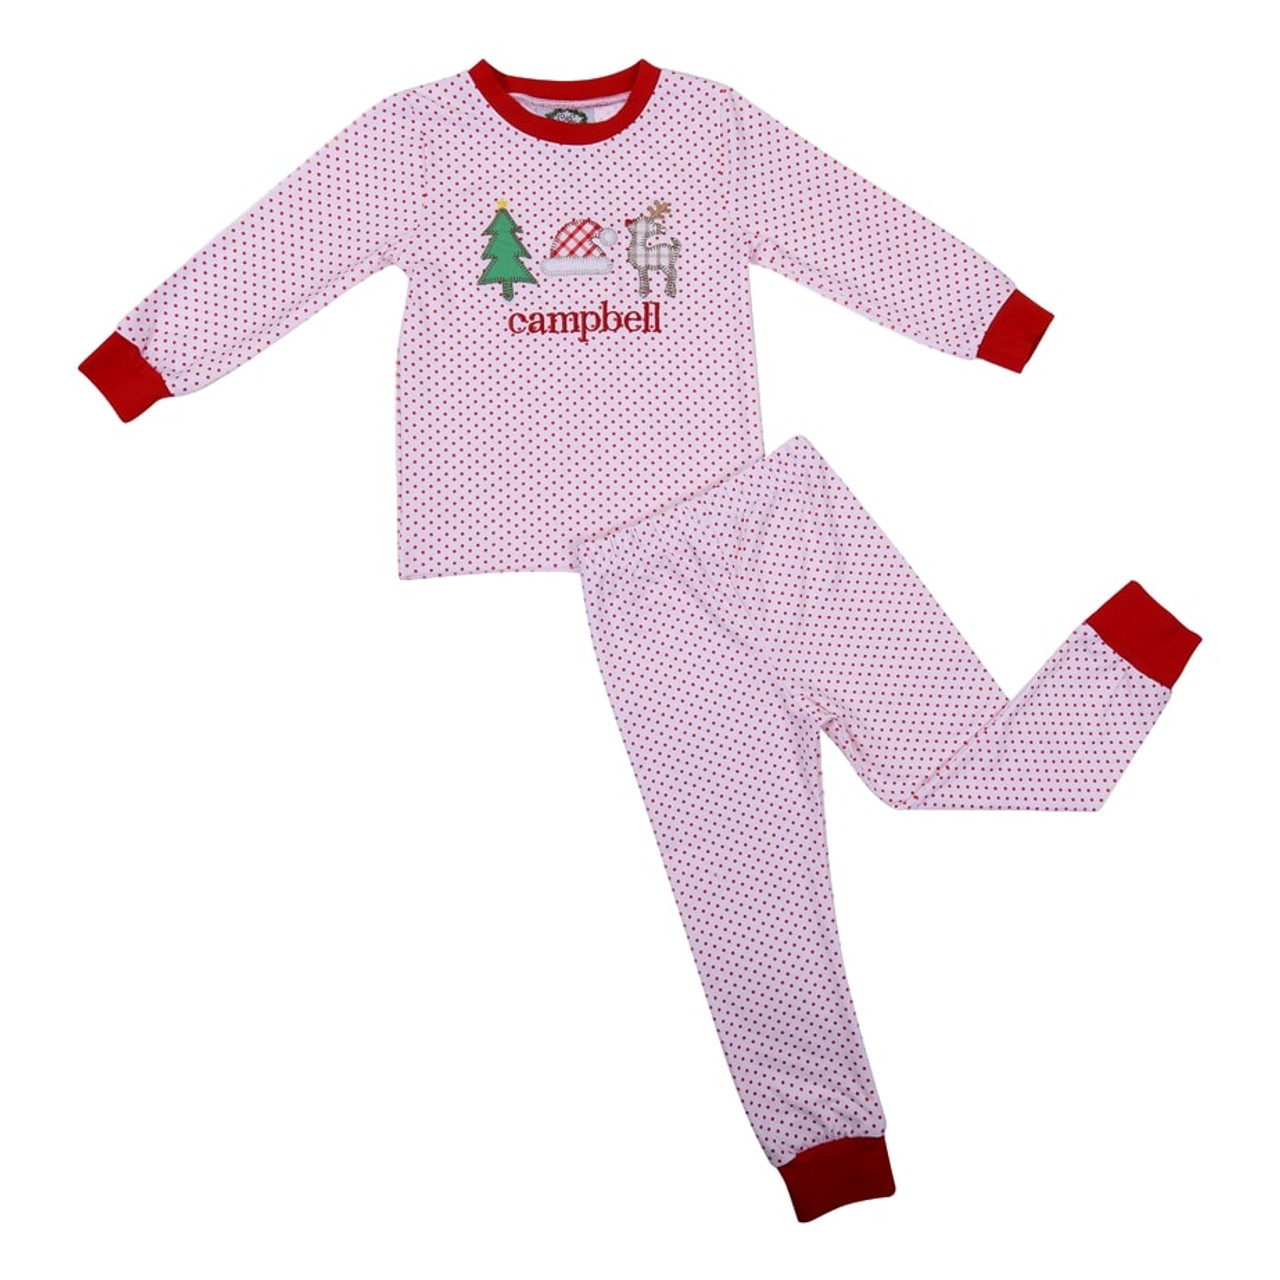 Christmas Pj.Red Knit Dot Applique Christmas Pj Set